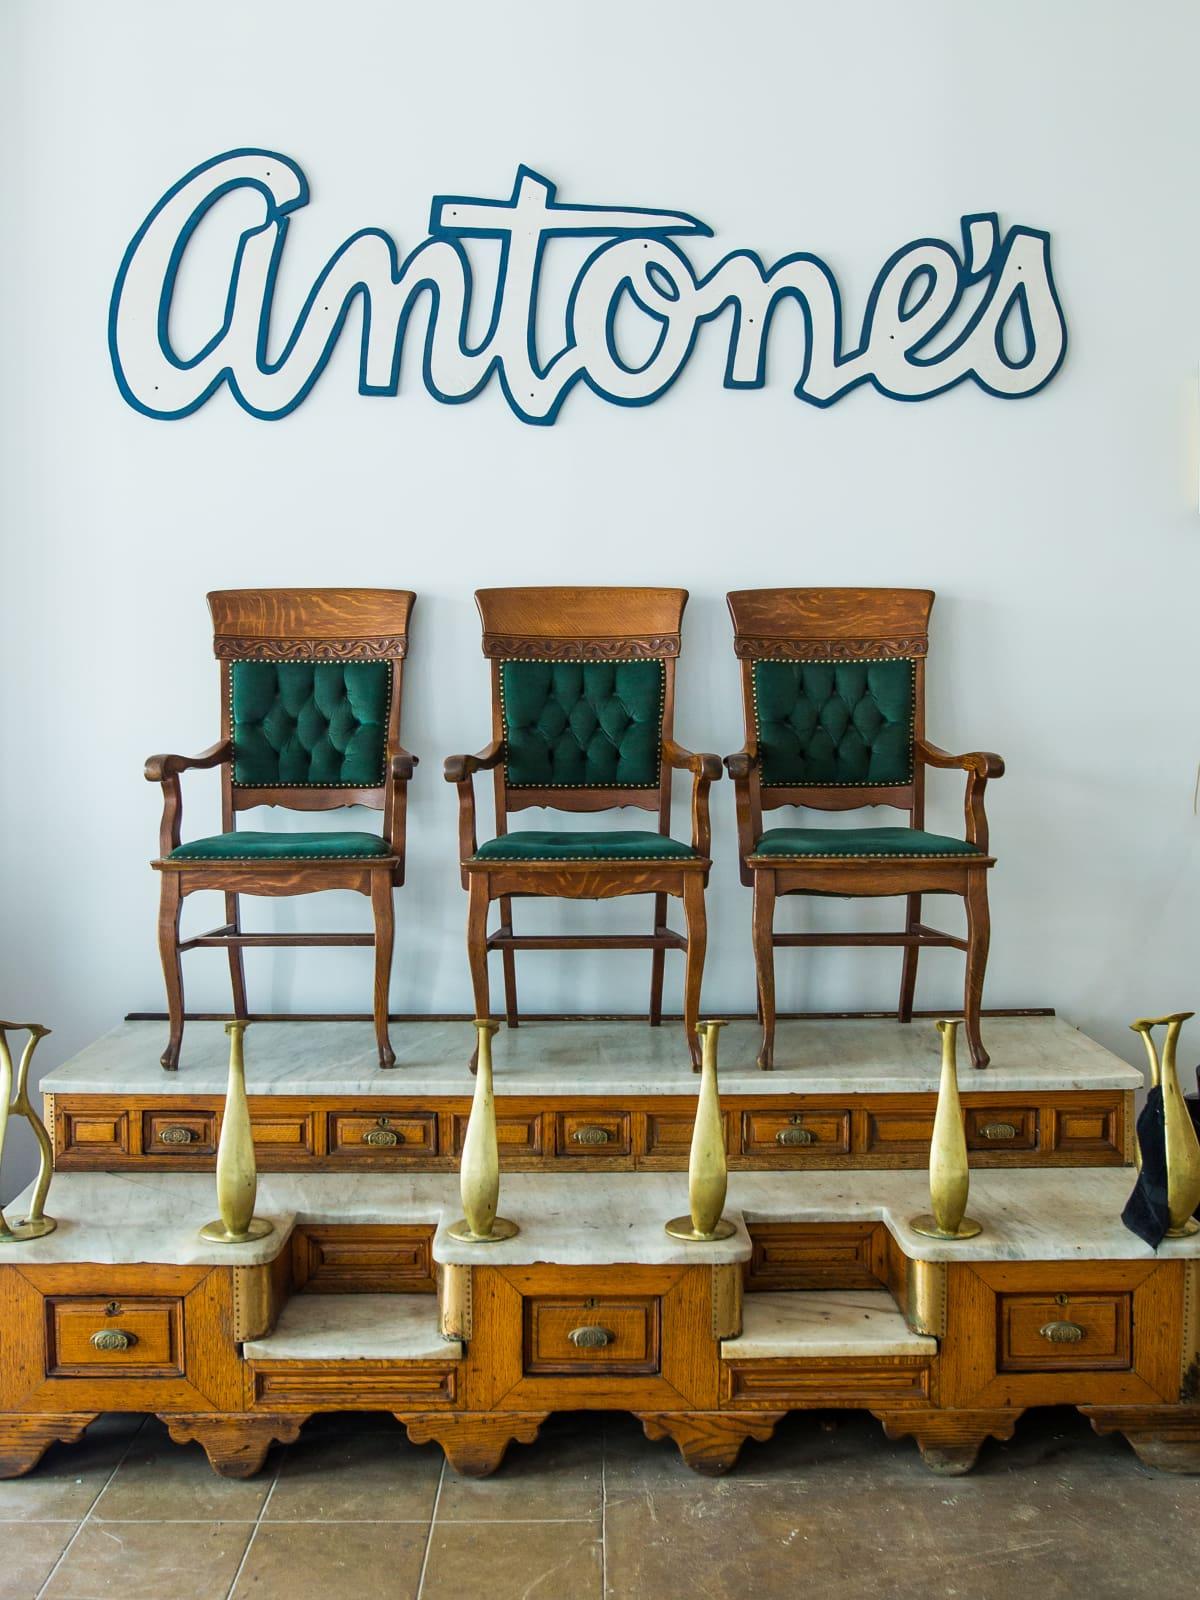 Antone's downtown venue Fifth Street 2016 logo shoe shining station chairs